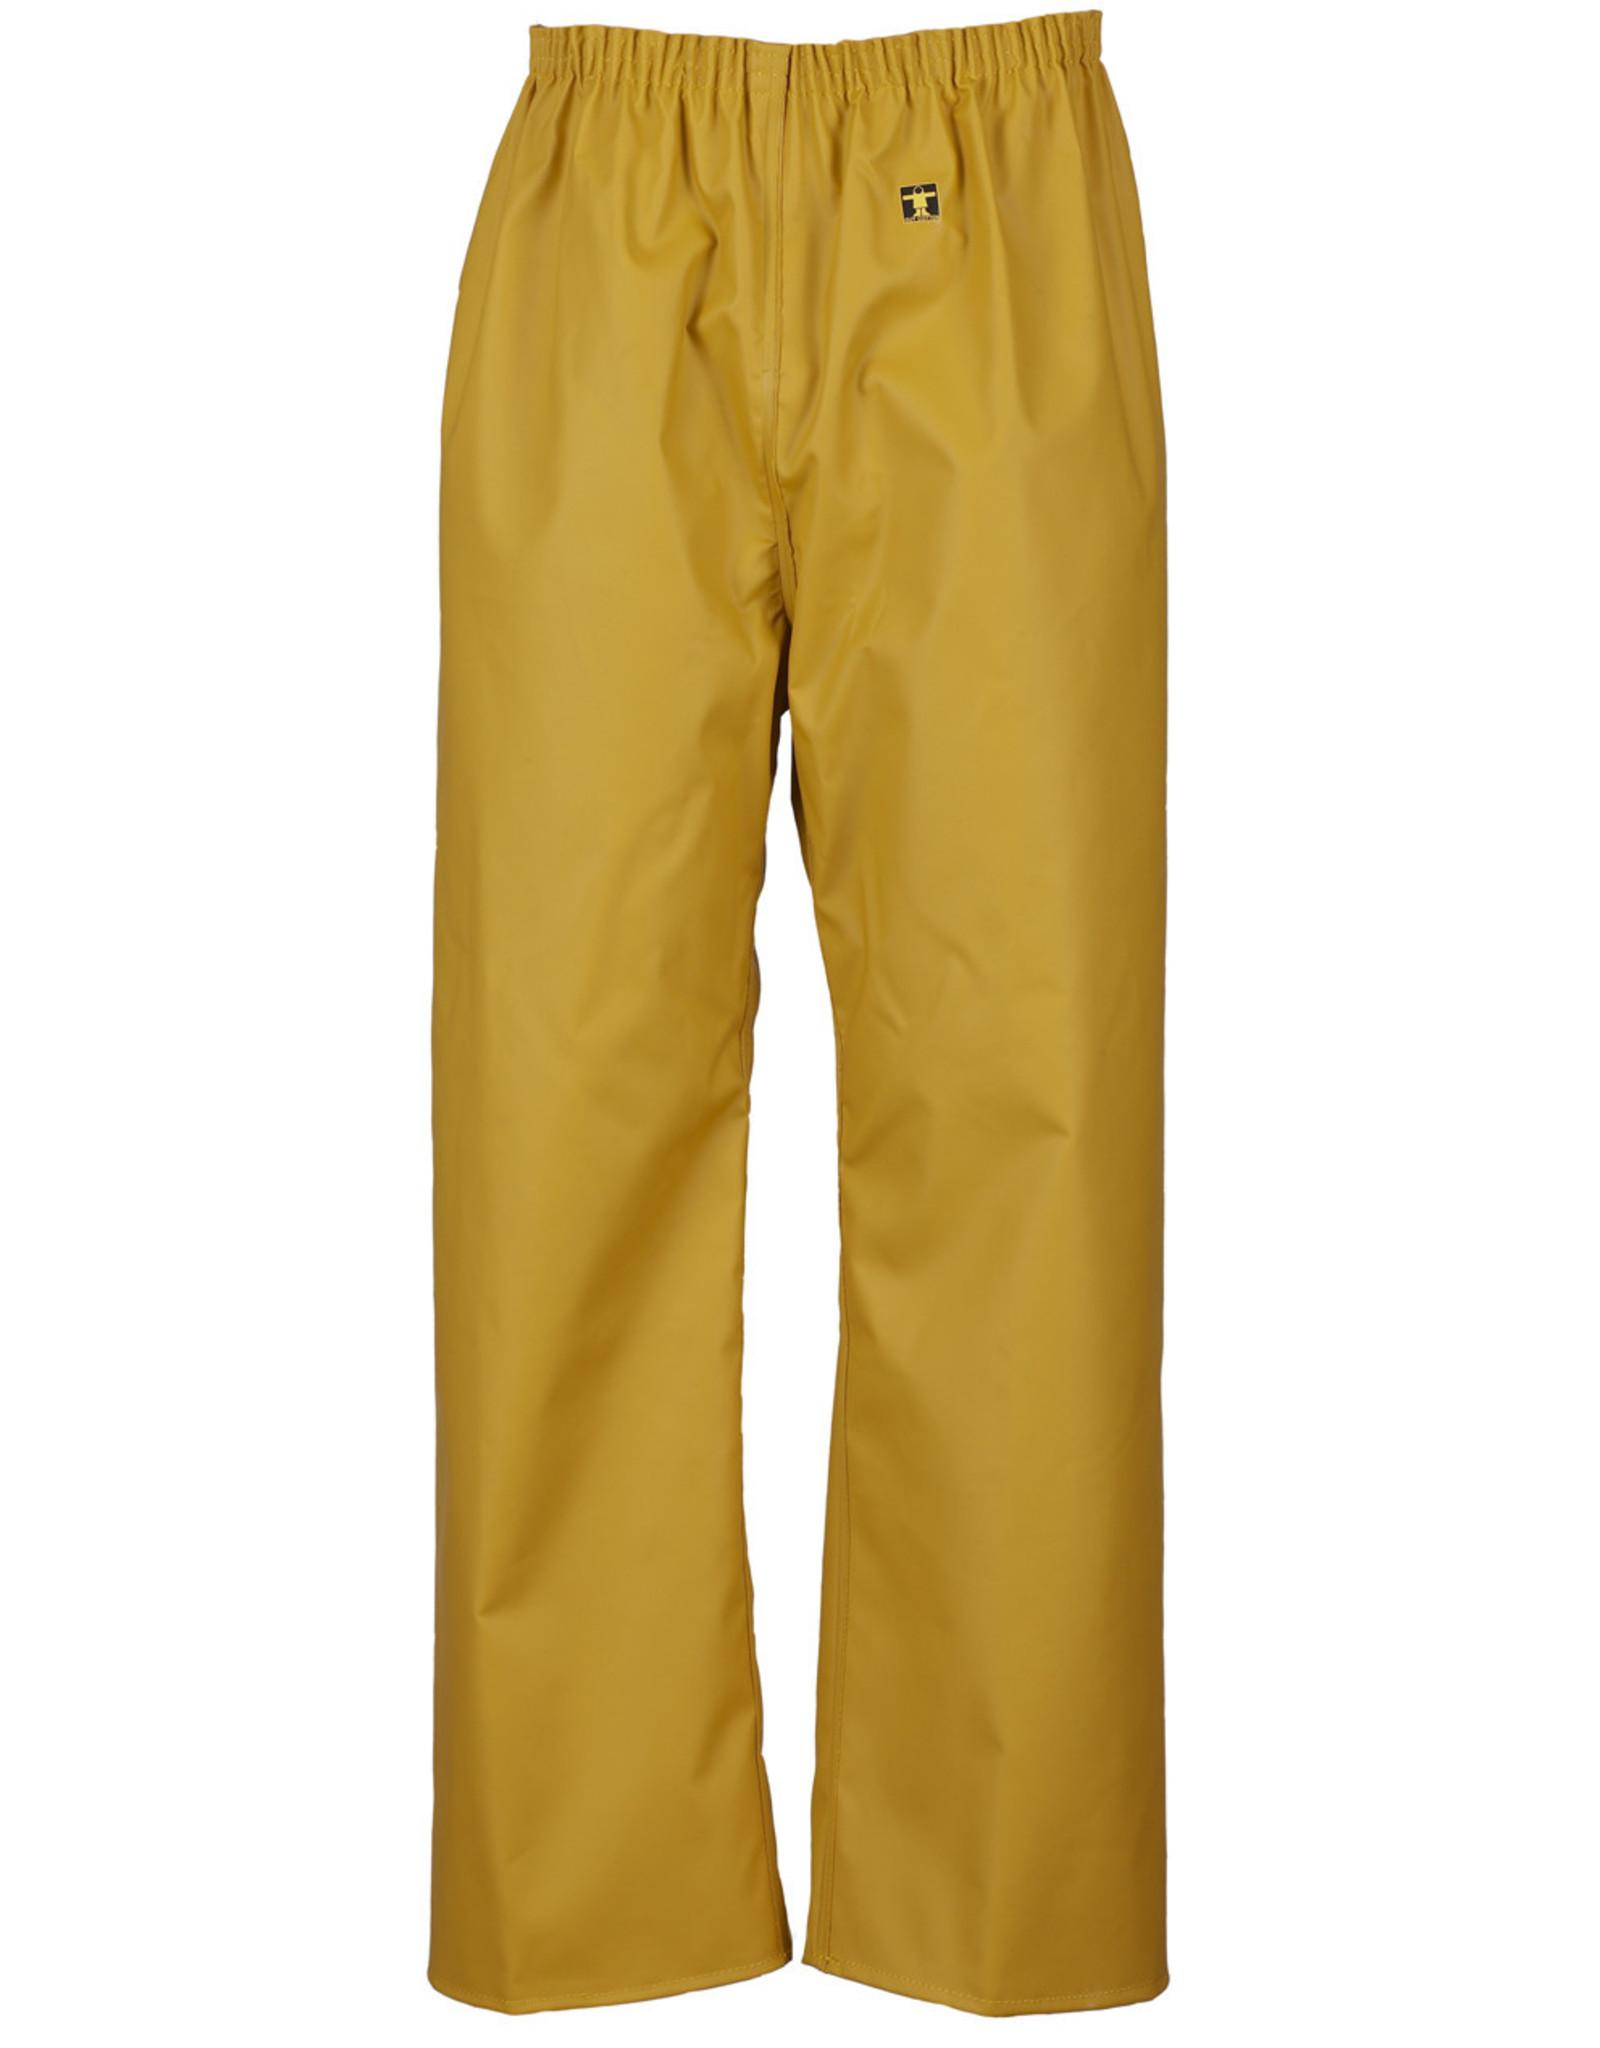 Guy Cotten Trousers POULDO Glentex